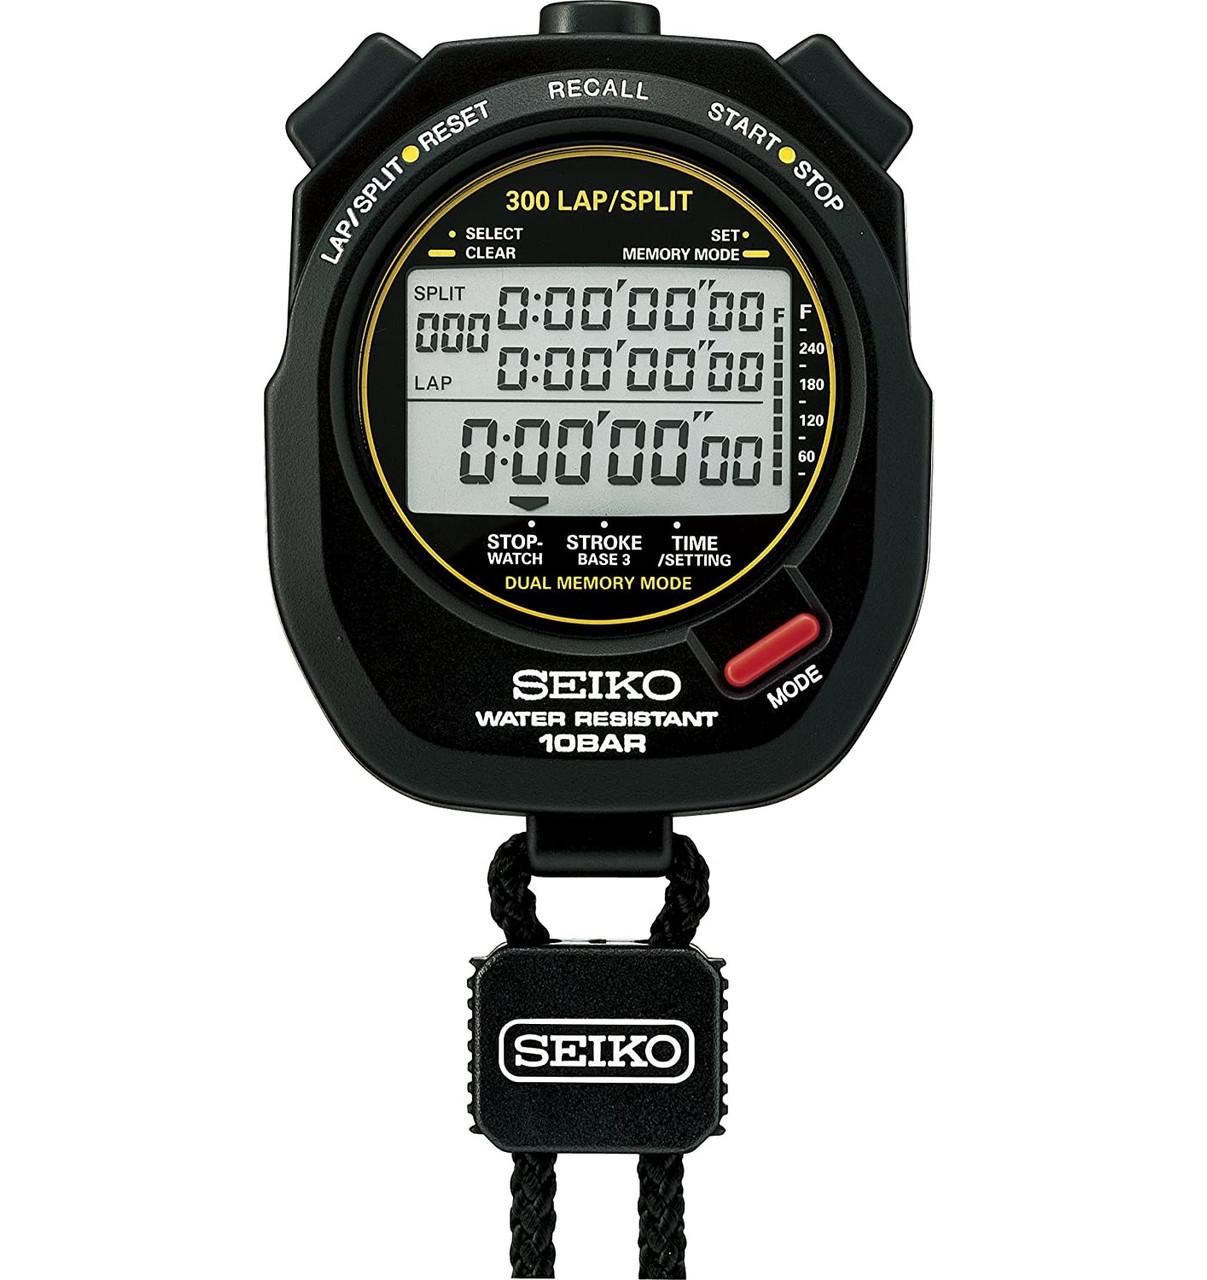 Seiko S141 300 Lap Memory Stopwatch for Aquatic Sports